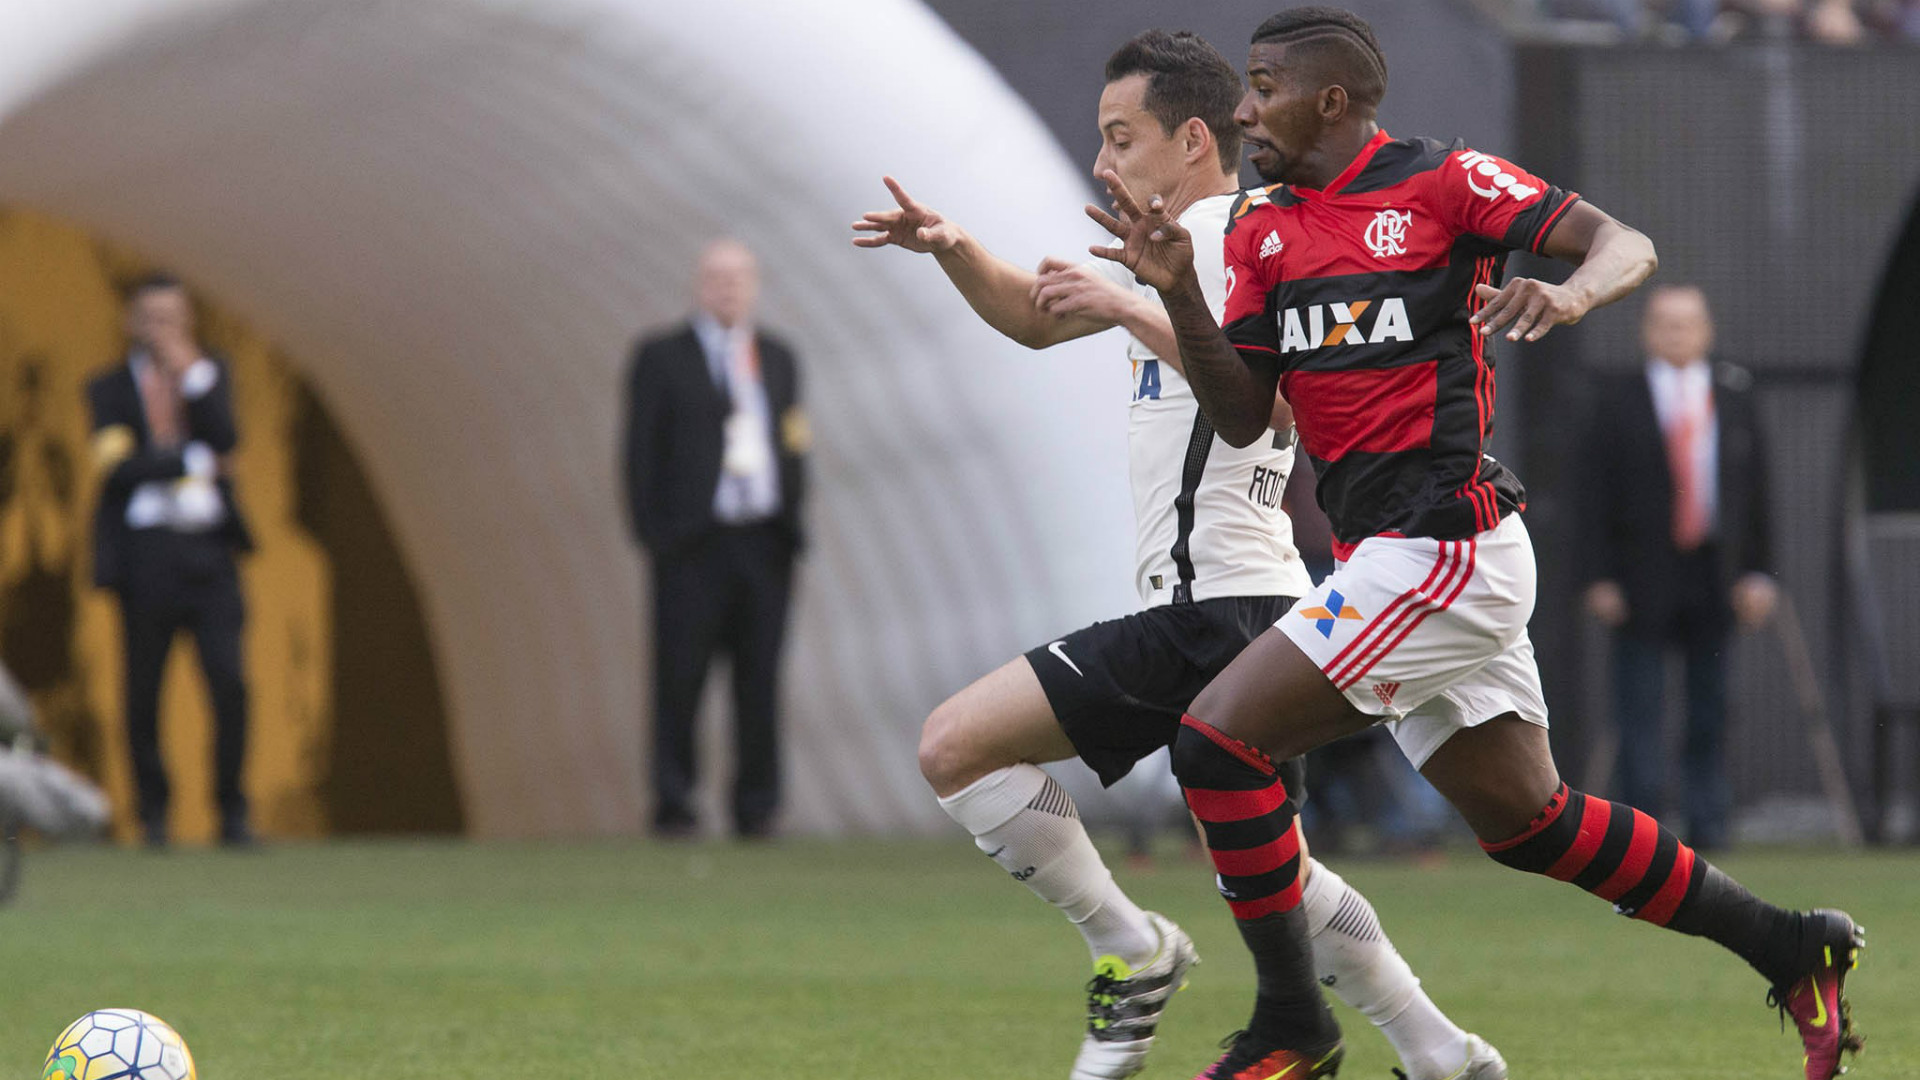 Rodriguinho - Corinthians x Flamengo - 03/07/16